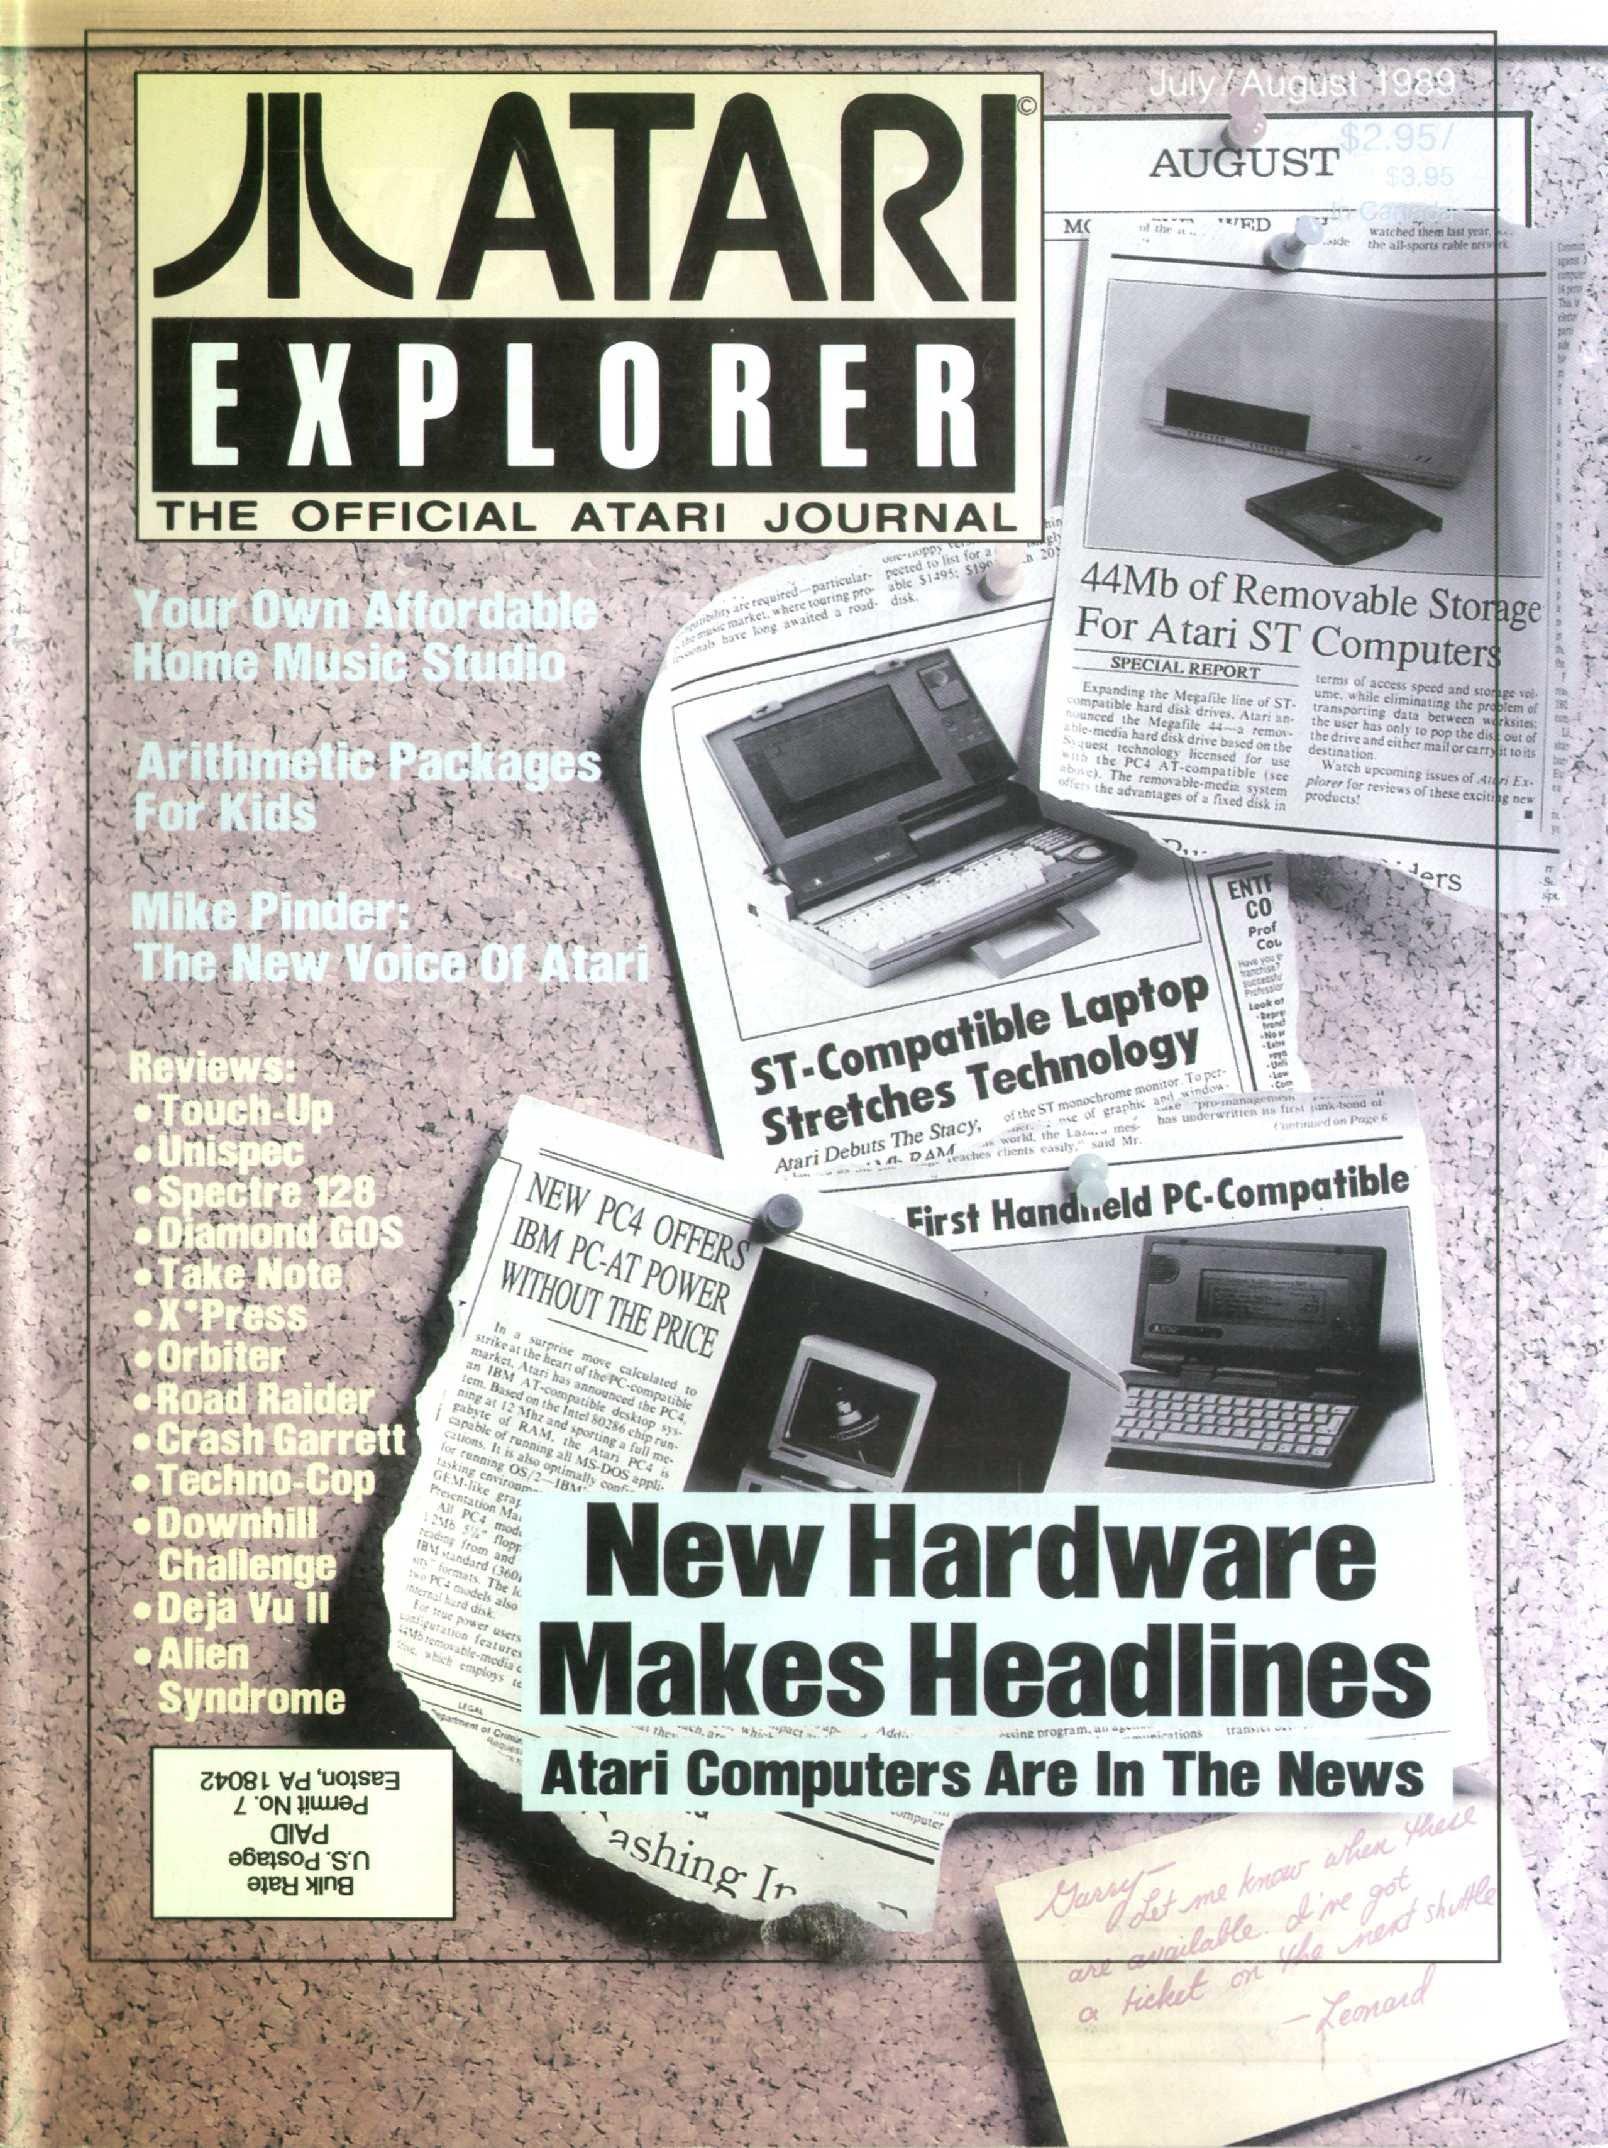 Atari Explorer Issue 21 (July / August 1989)